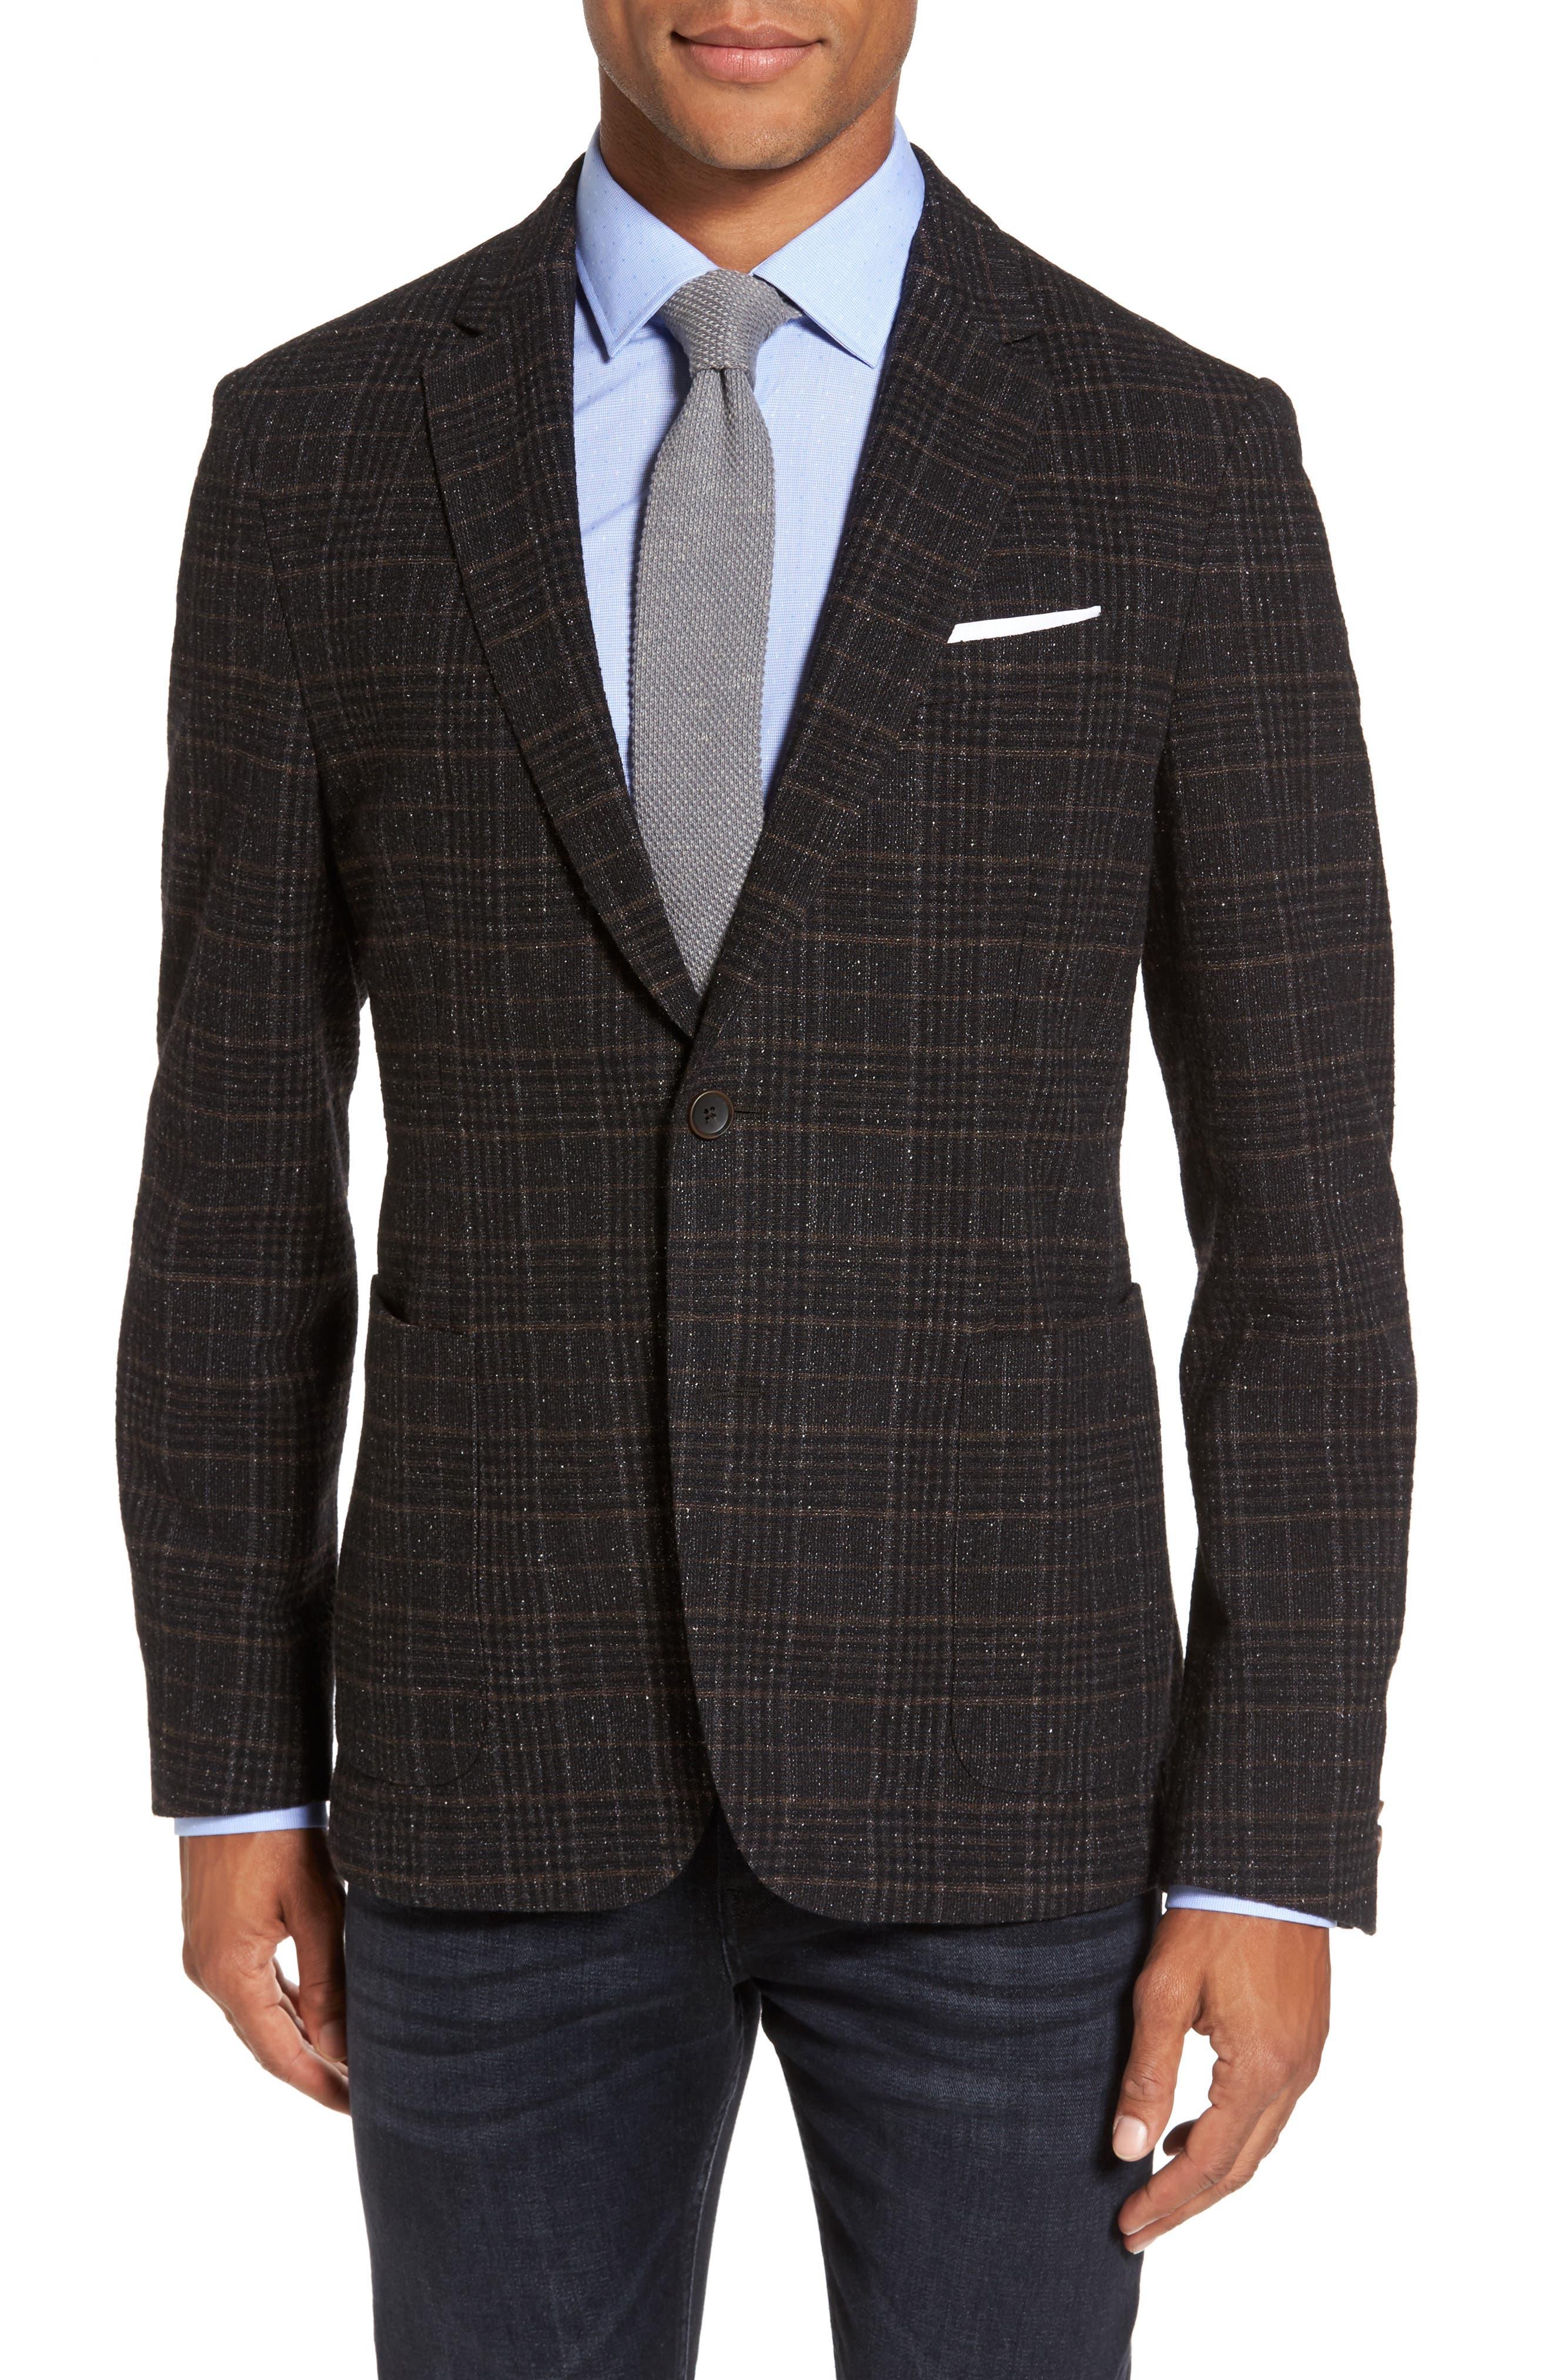 Main Image - BOSS Nold Trim Fit Plaid Wool Blend Sport Coat